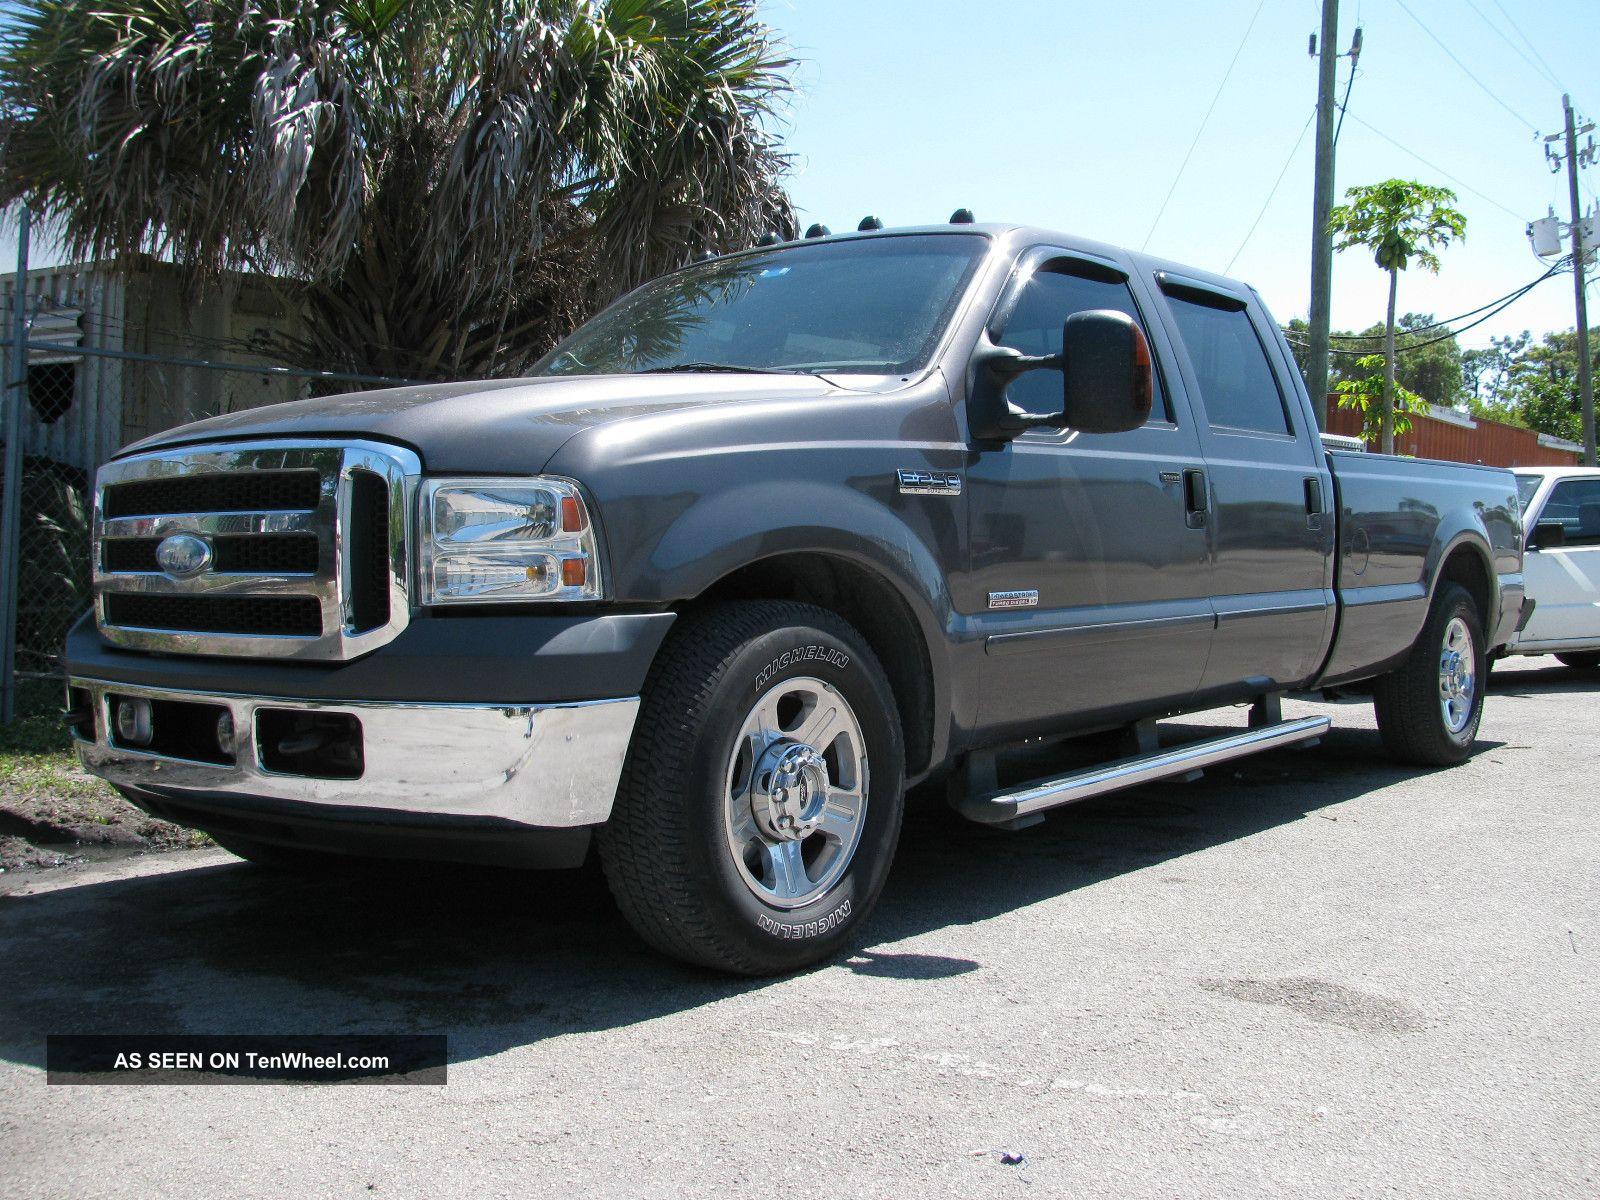 2007 ford f250 crewcab 6 0 powerstroke diesel. Black Bedroom Furniture Sets. Home Design Ideas